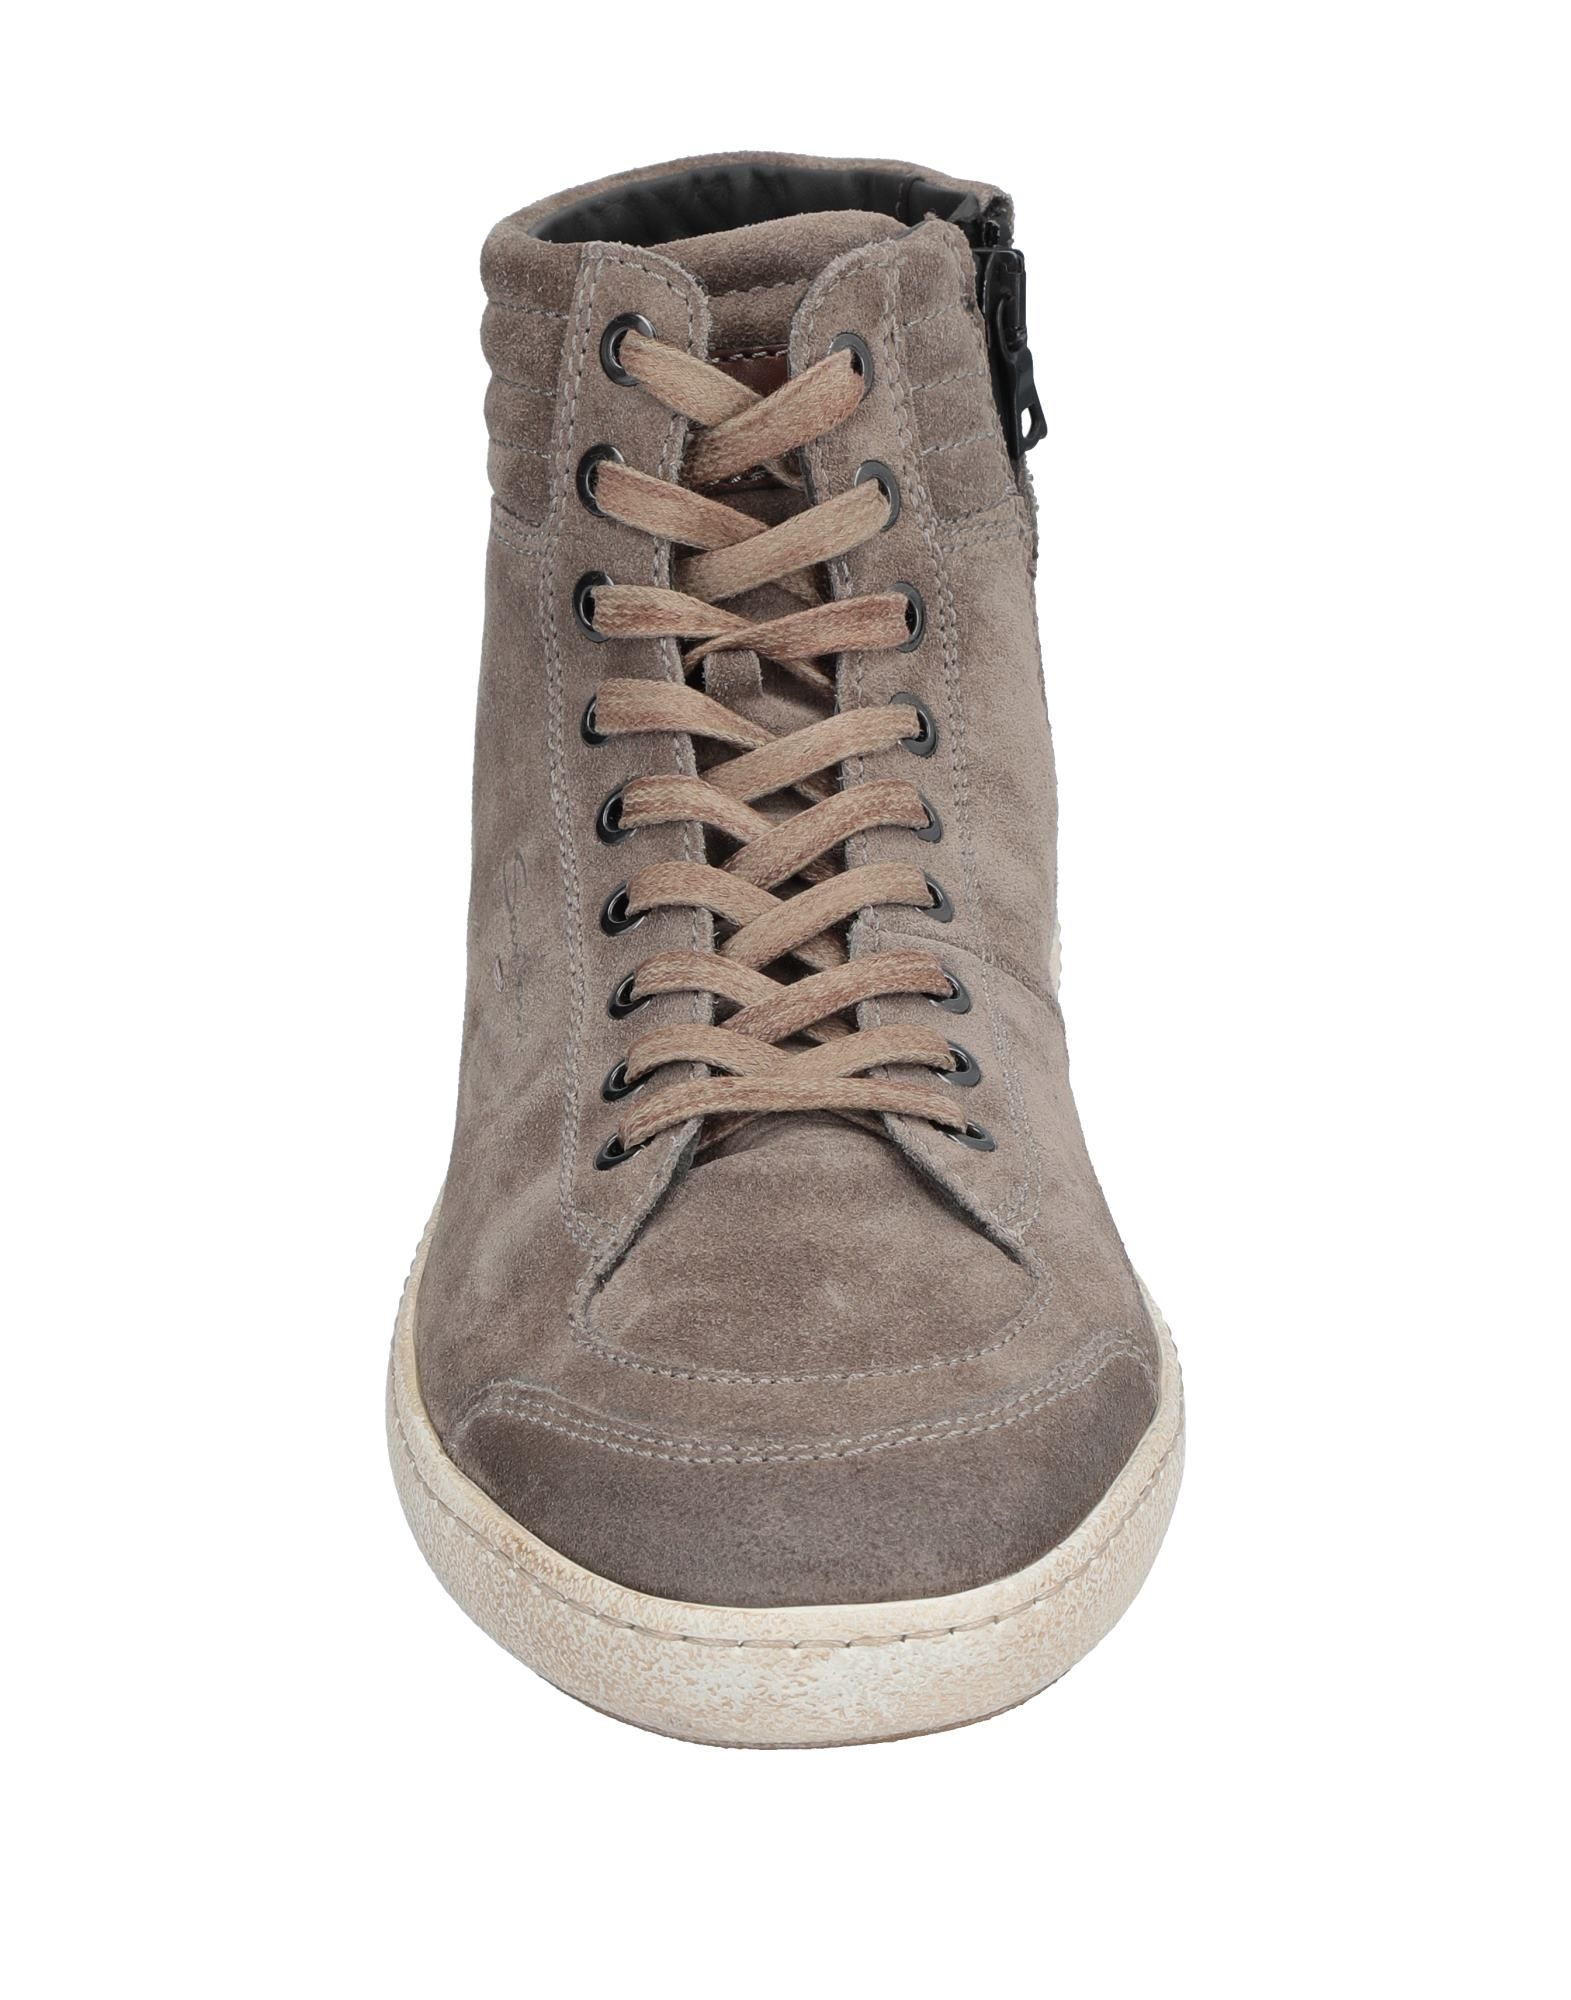 Santoni Sneakers - - - Men Santoni Sneakers online on  Australia - 11533854CE 324ace